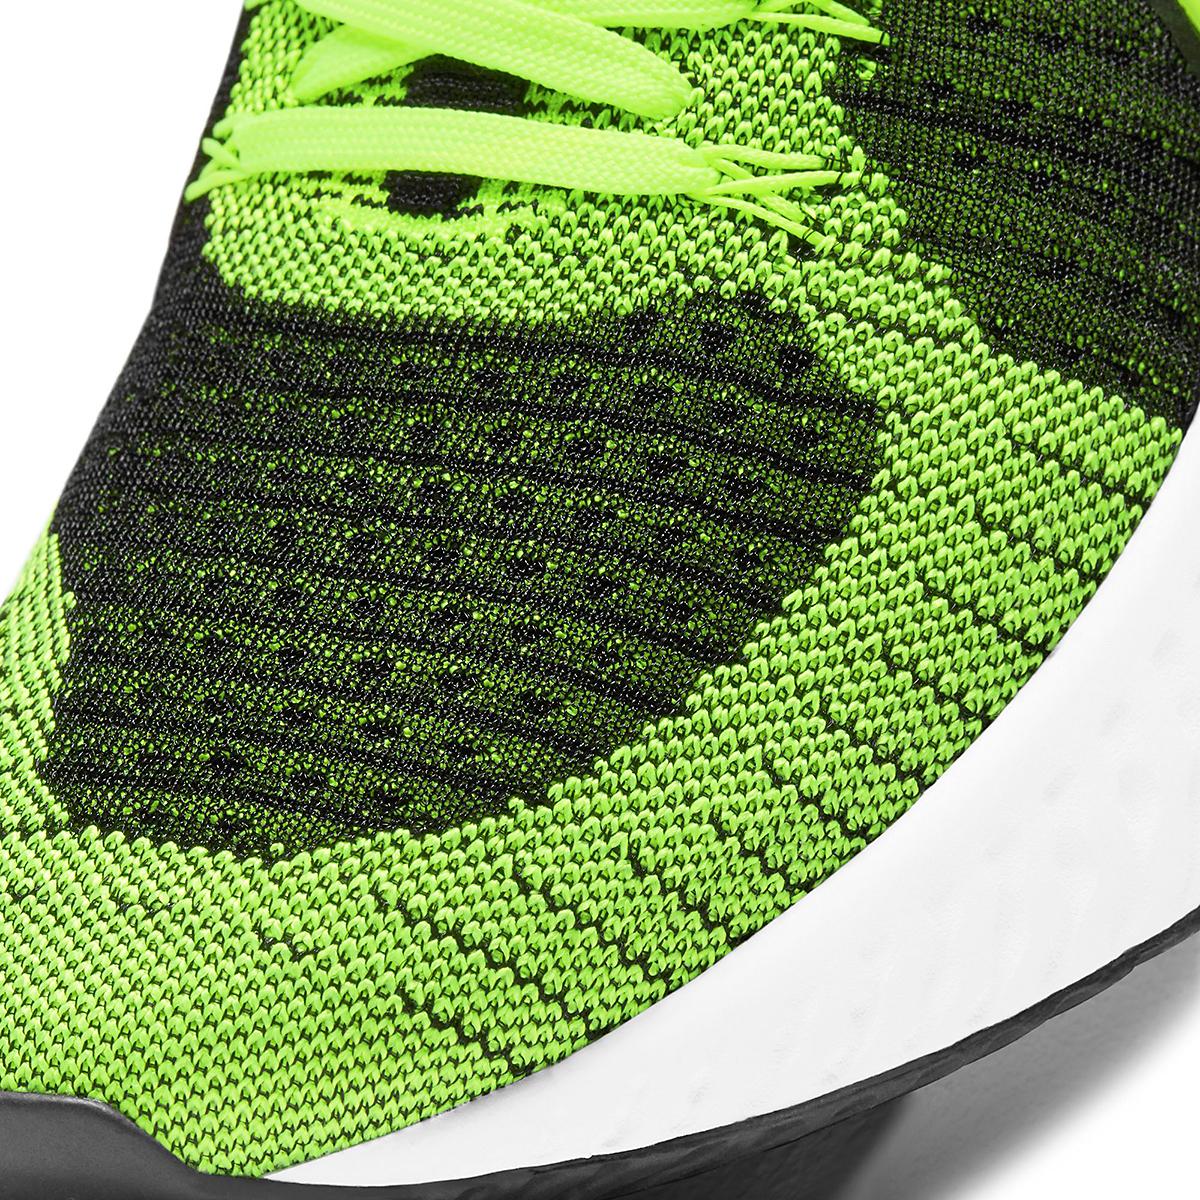 Men's Nike React Infinity Run Flyknit 2 Running Shoe - Color: Volt/Black - Size: 6 - Width: Regular, Volt/Black, large, image 4